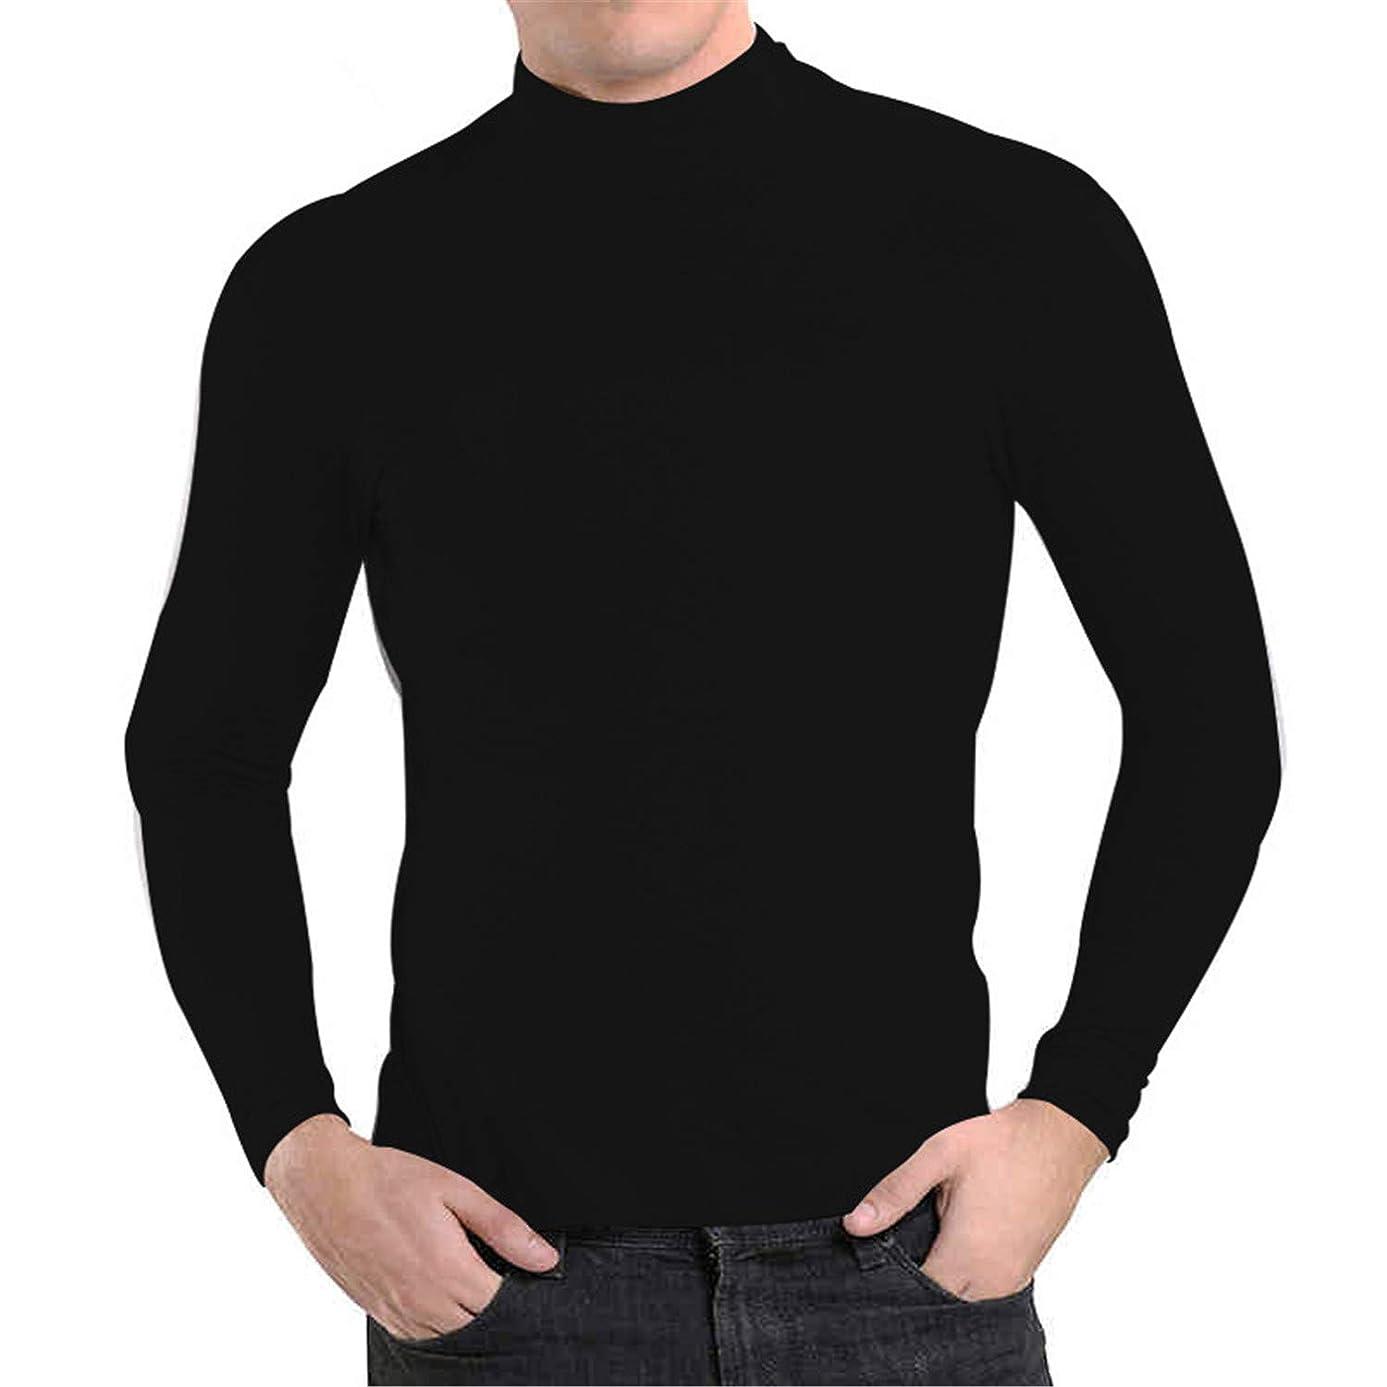 Mens Cotton Winter Thermal Underwear Long Johns Turtleneck Tops High Collar Plus Size